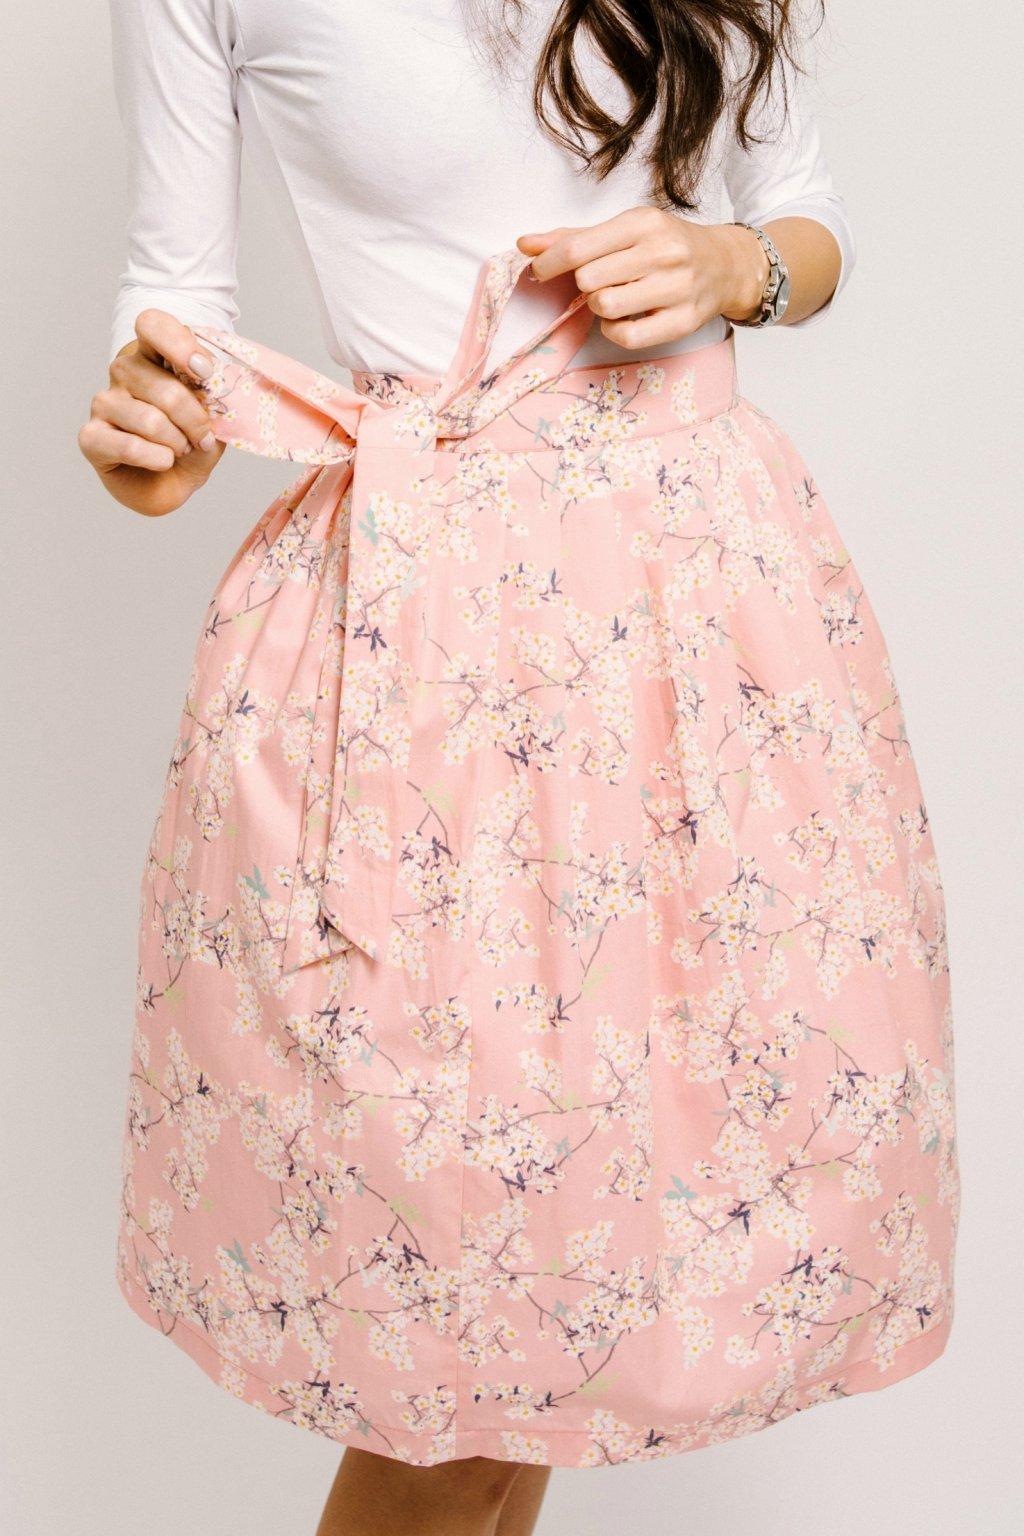 24e26065dee8 sukně Ava reparáda sukně BEA Reparáda sukně MÍNA Reparáda ...